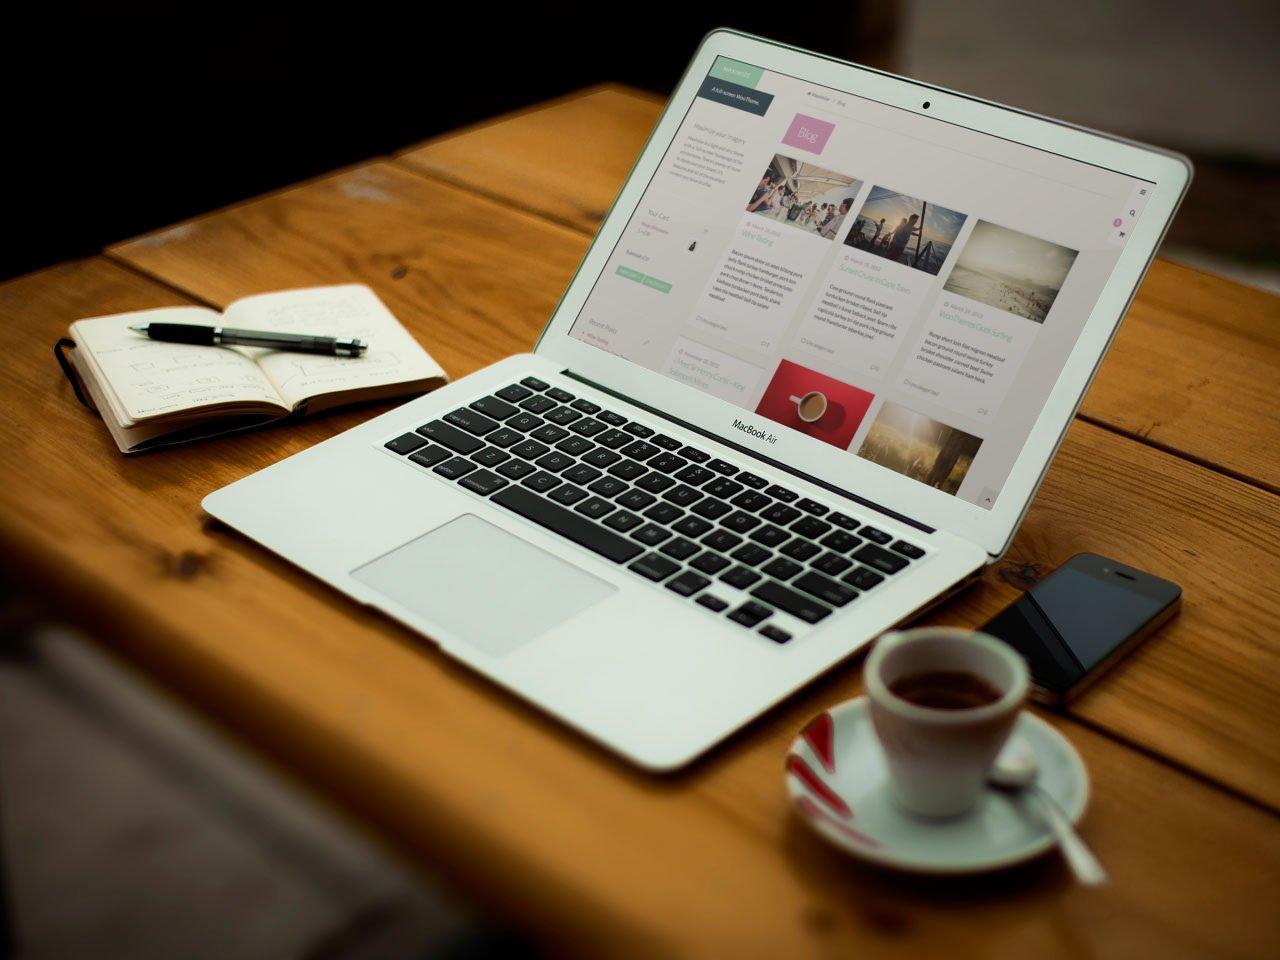 https://www.virtualars.it/wp-content/uploads/2018/09/blog-laptop-copy-2-1280x960.jpg